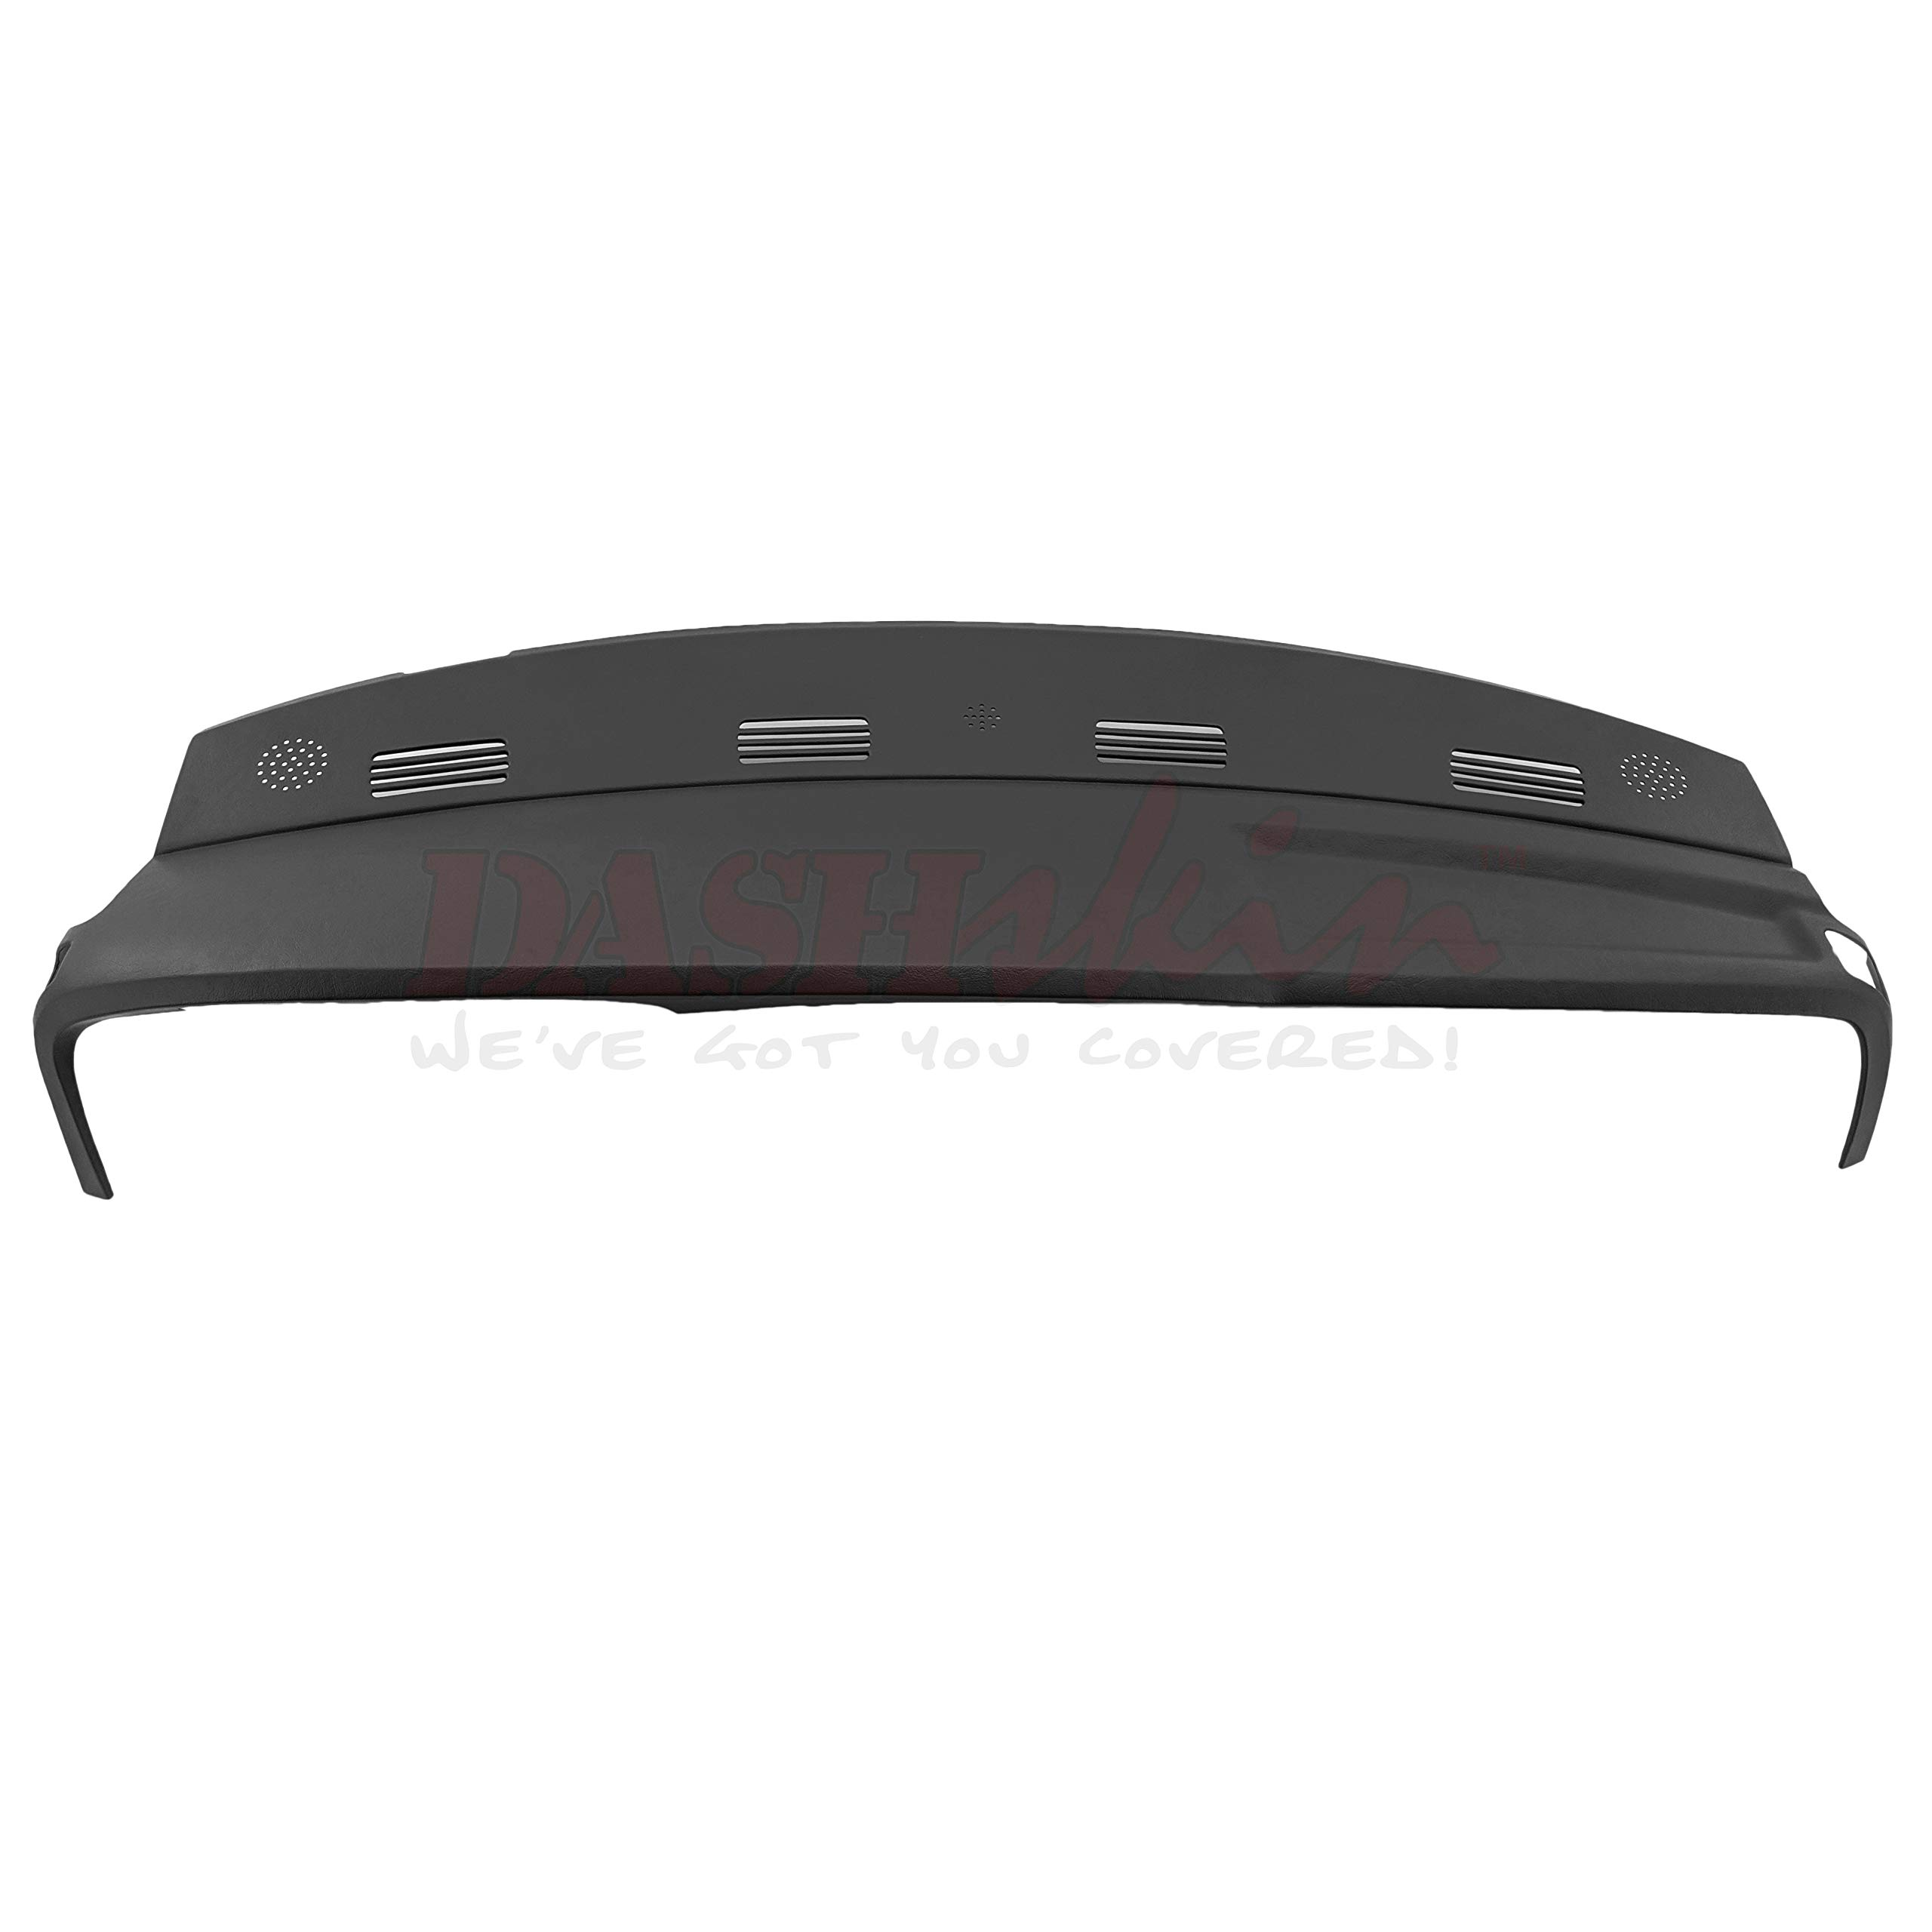 DashSkin Molded Dash Cover Compatible with 02-05 Dodge Ram in Dark Slate Grey